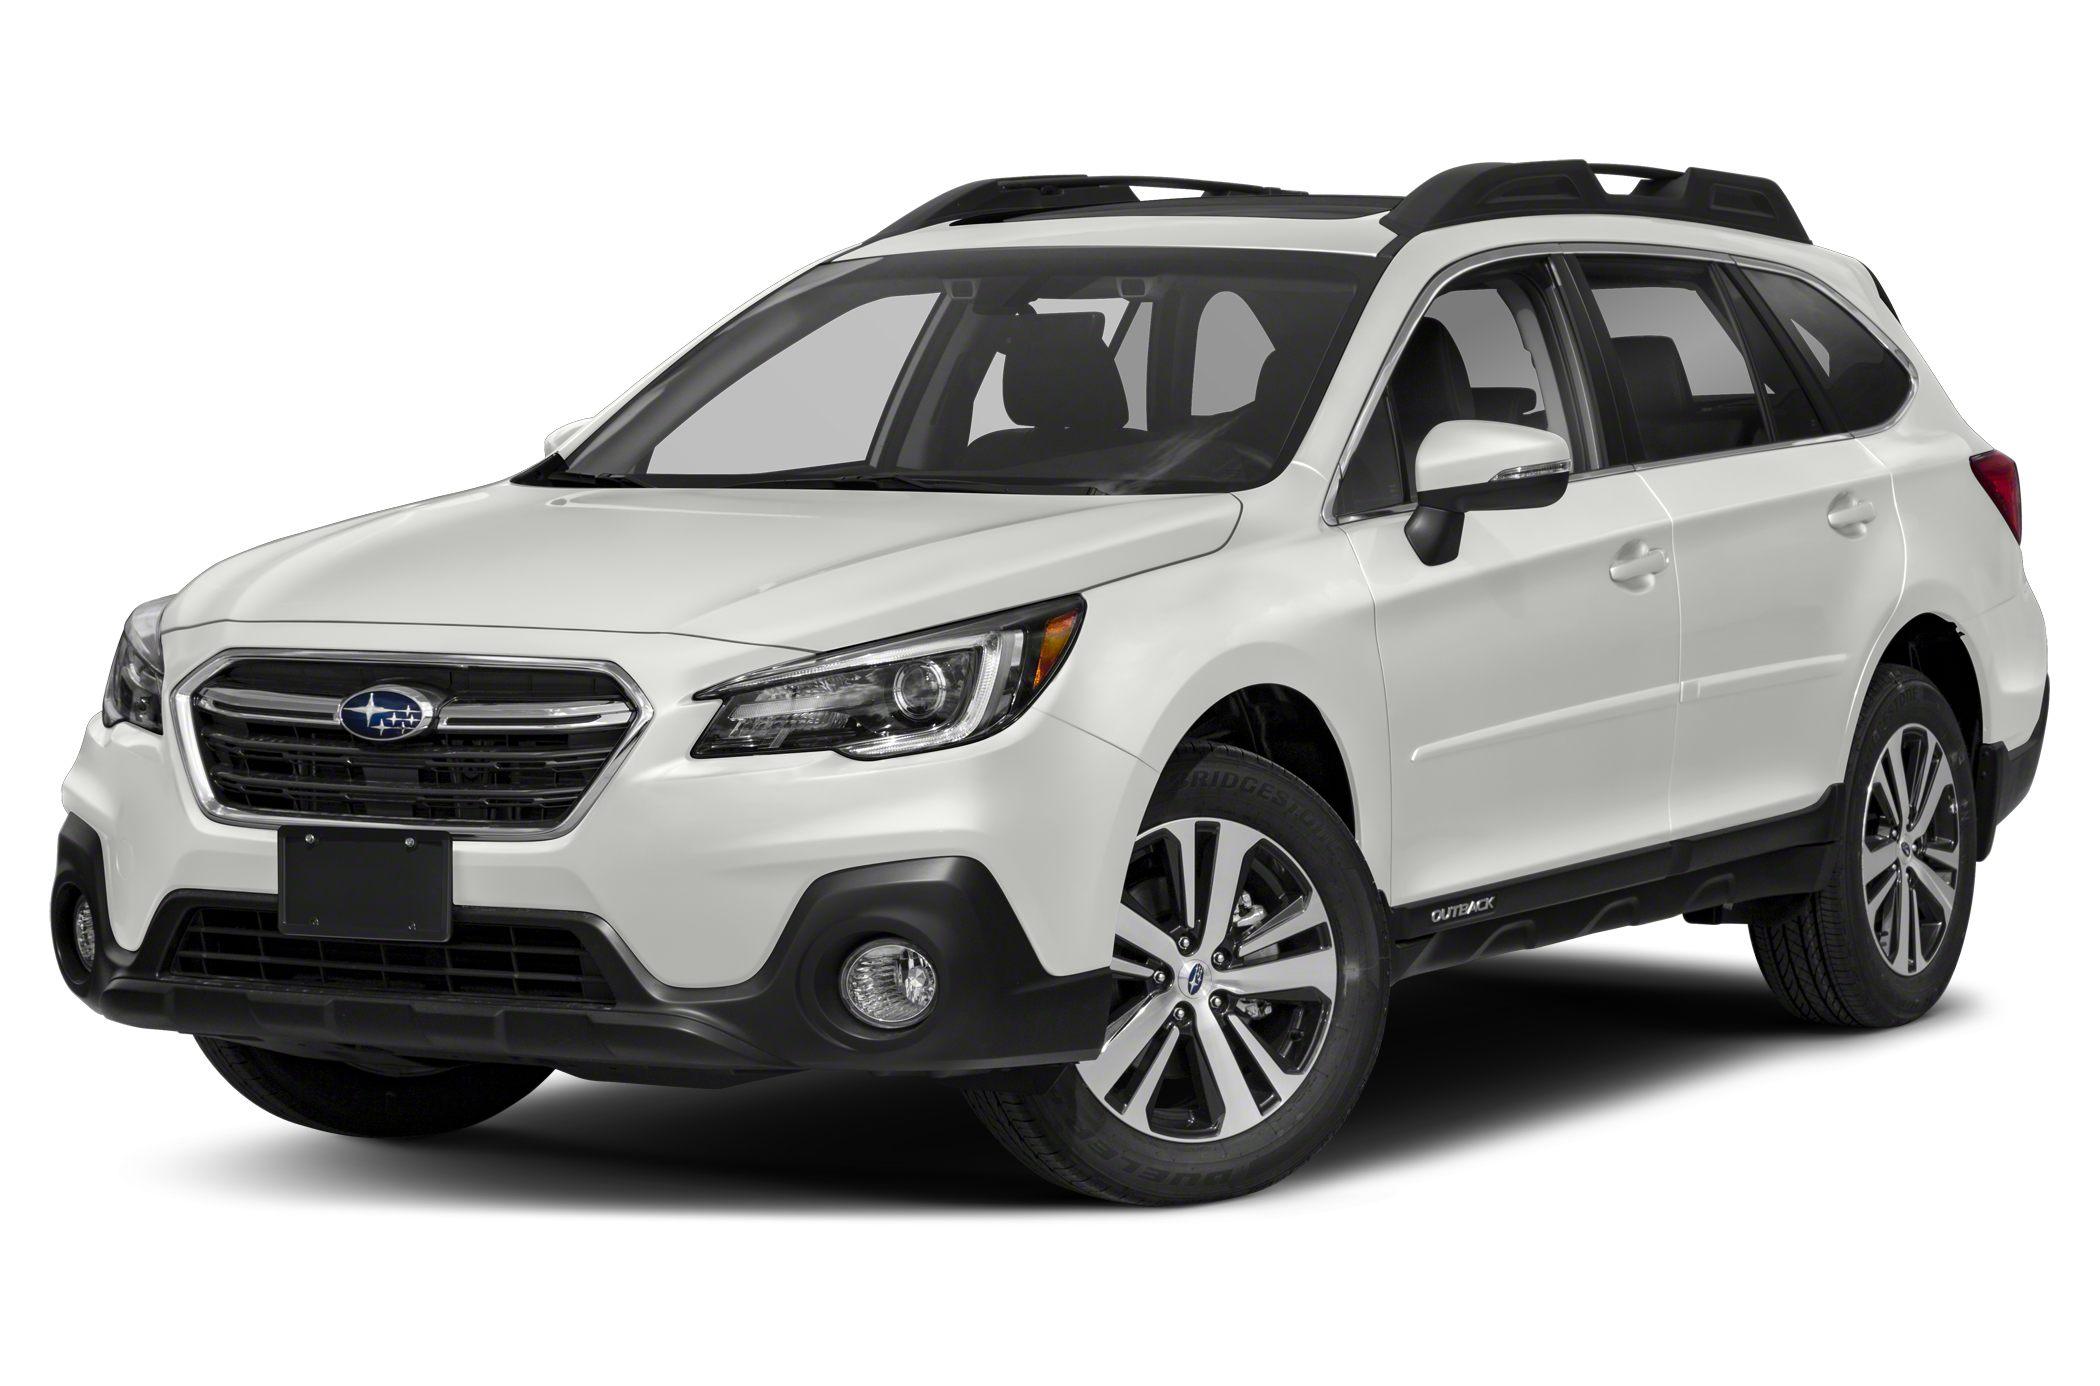 2019 Subaru Outback 2.5i Limited 4dr All-wheel Drive